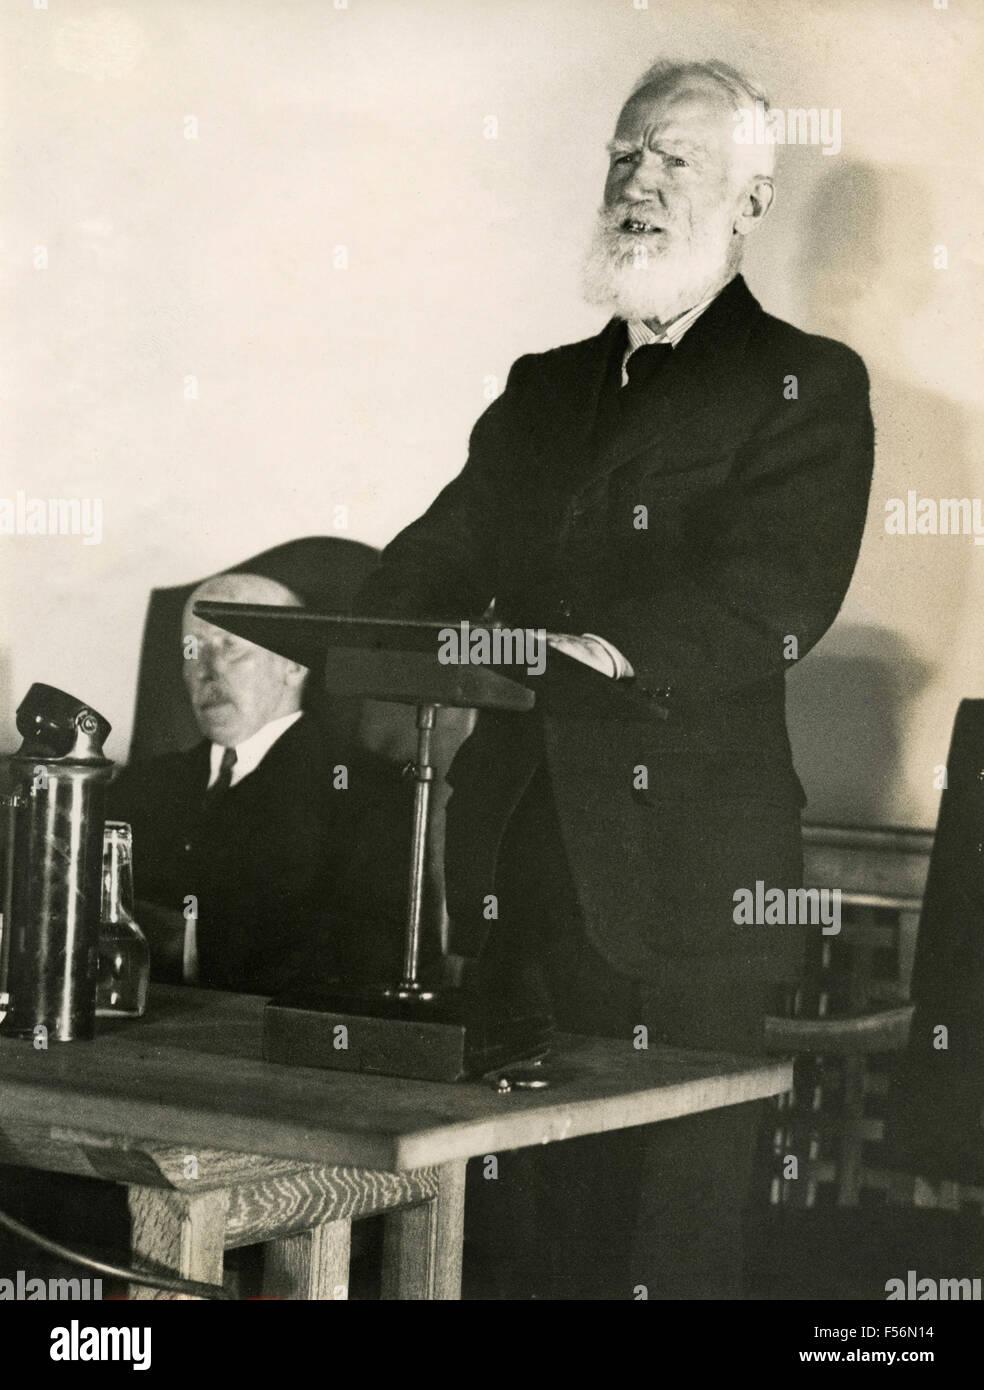 The Irish playwright George Bernard Shaw speaks to the British Academy, London, UK - Stock Image